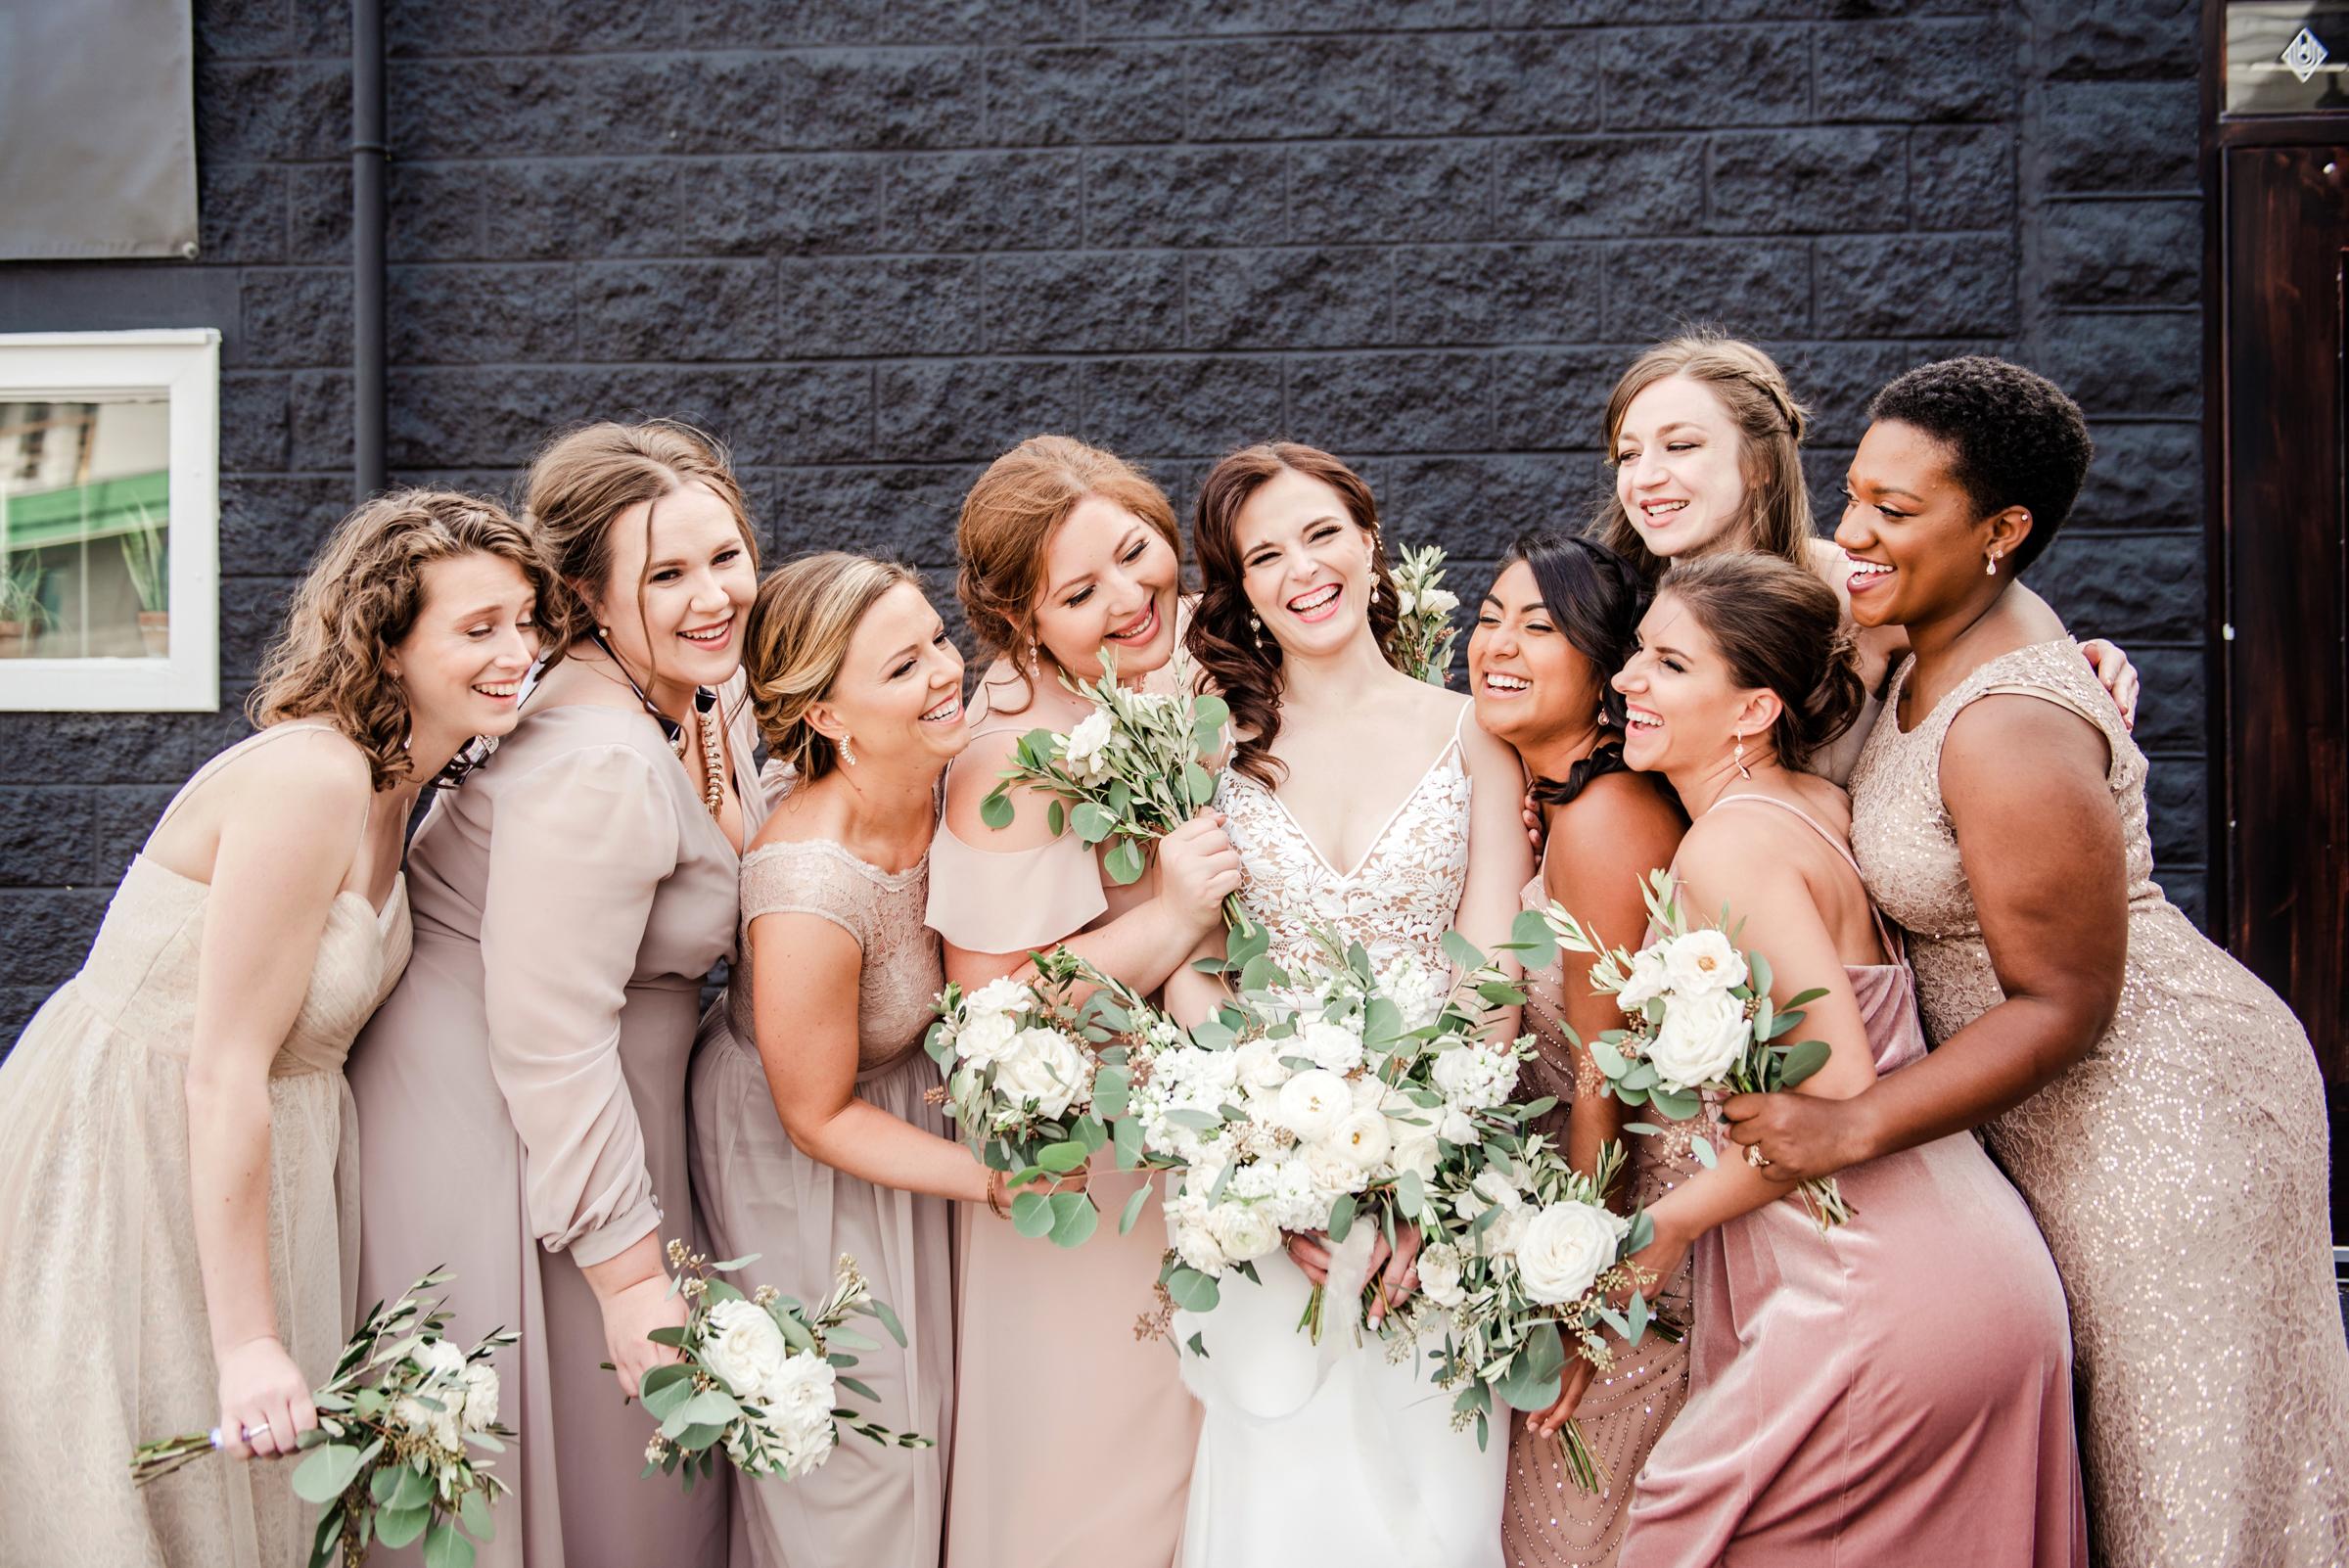 The_Arbor_LoftRochester_Wedding_JILL_STUDIO_Rochester_NY_Photographer_155539.jpg